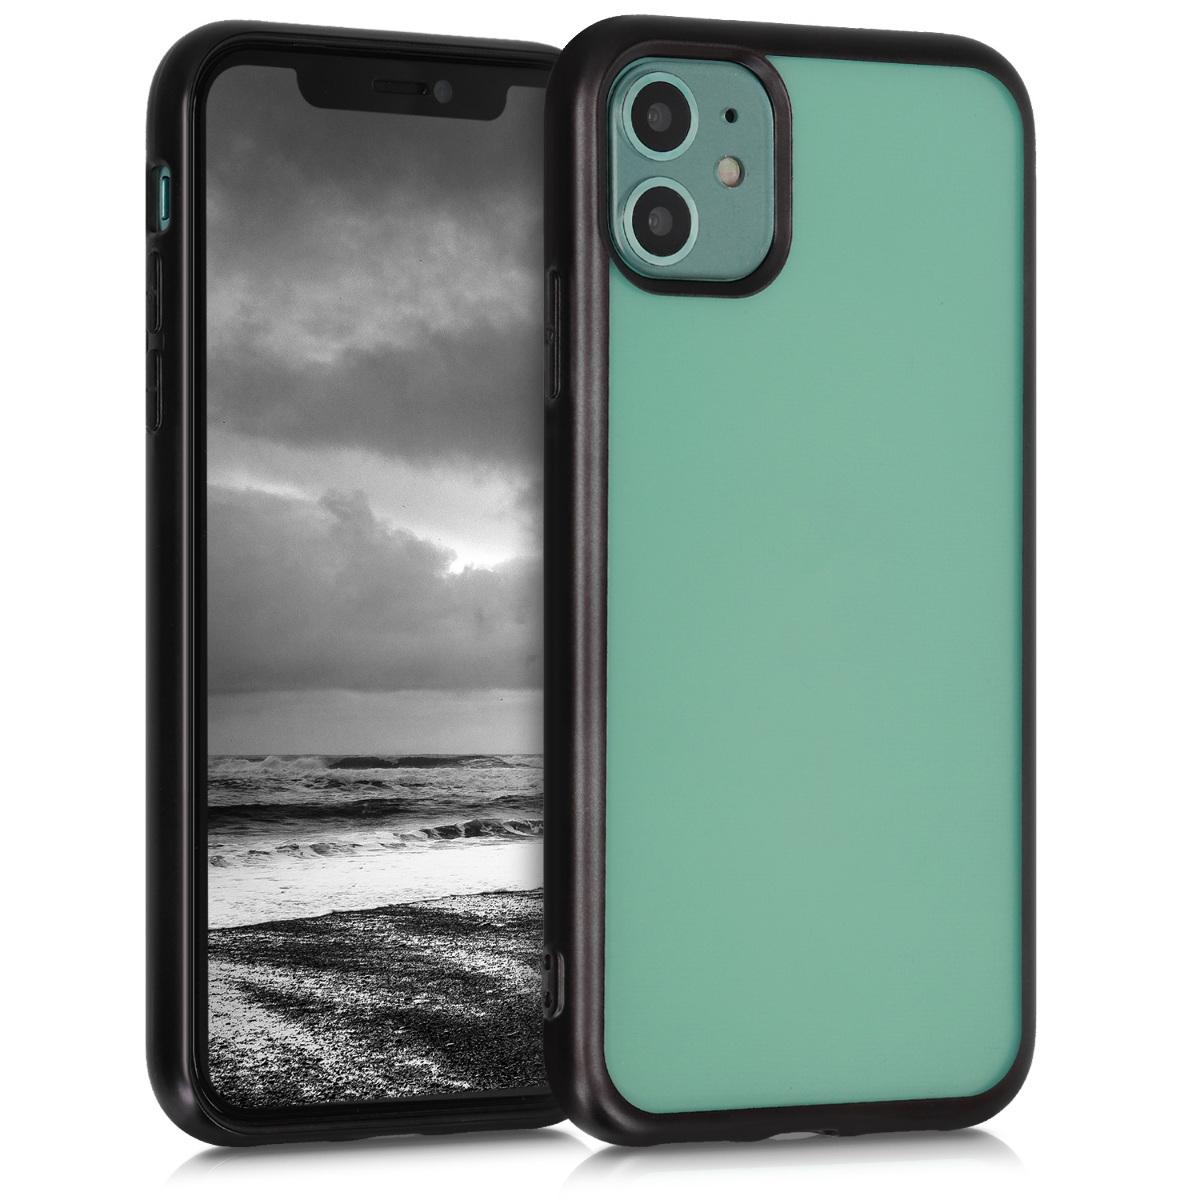 Kvalitní silikonové TPU pouzdro pro Apple iPhone 11 - Black | Matte Transparent